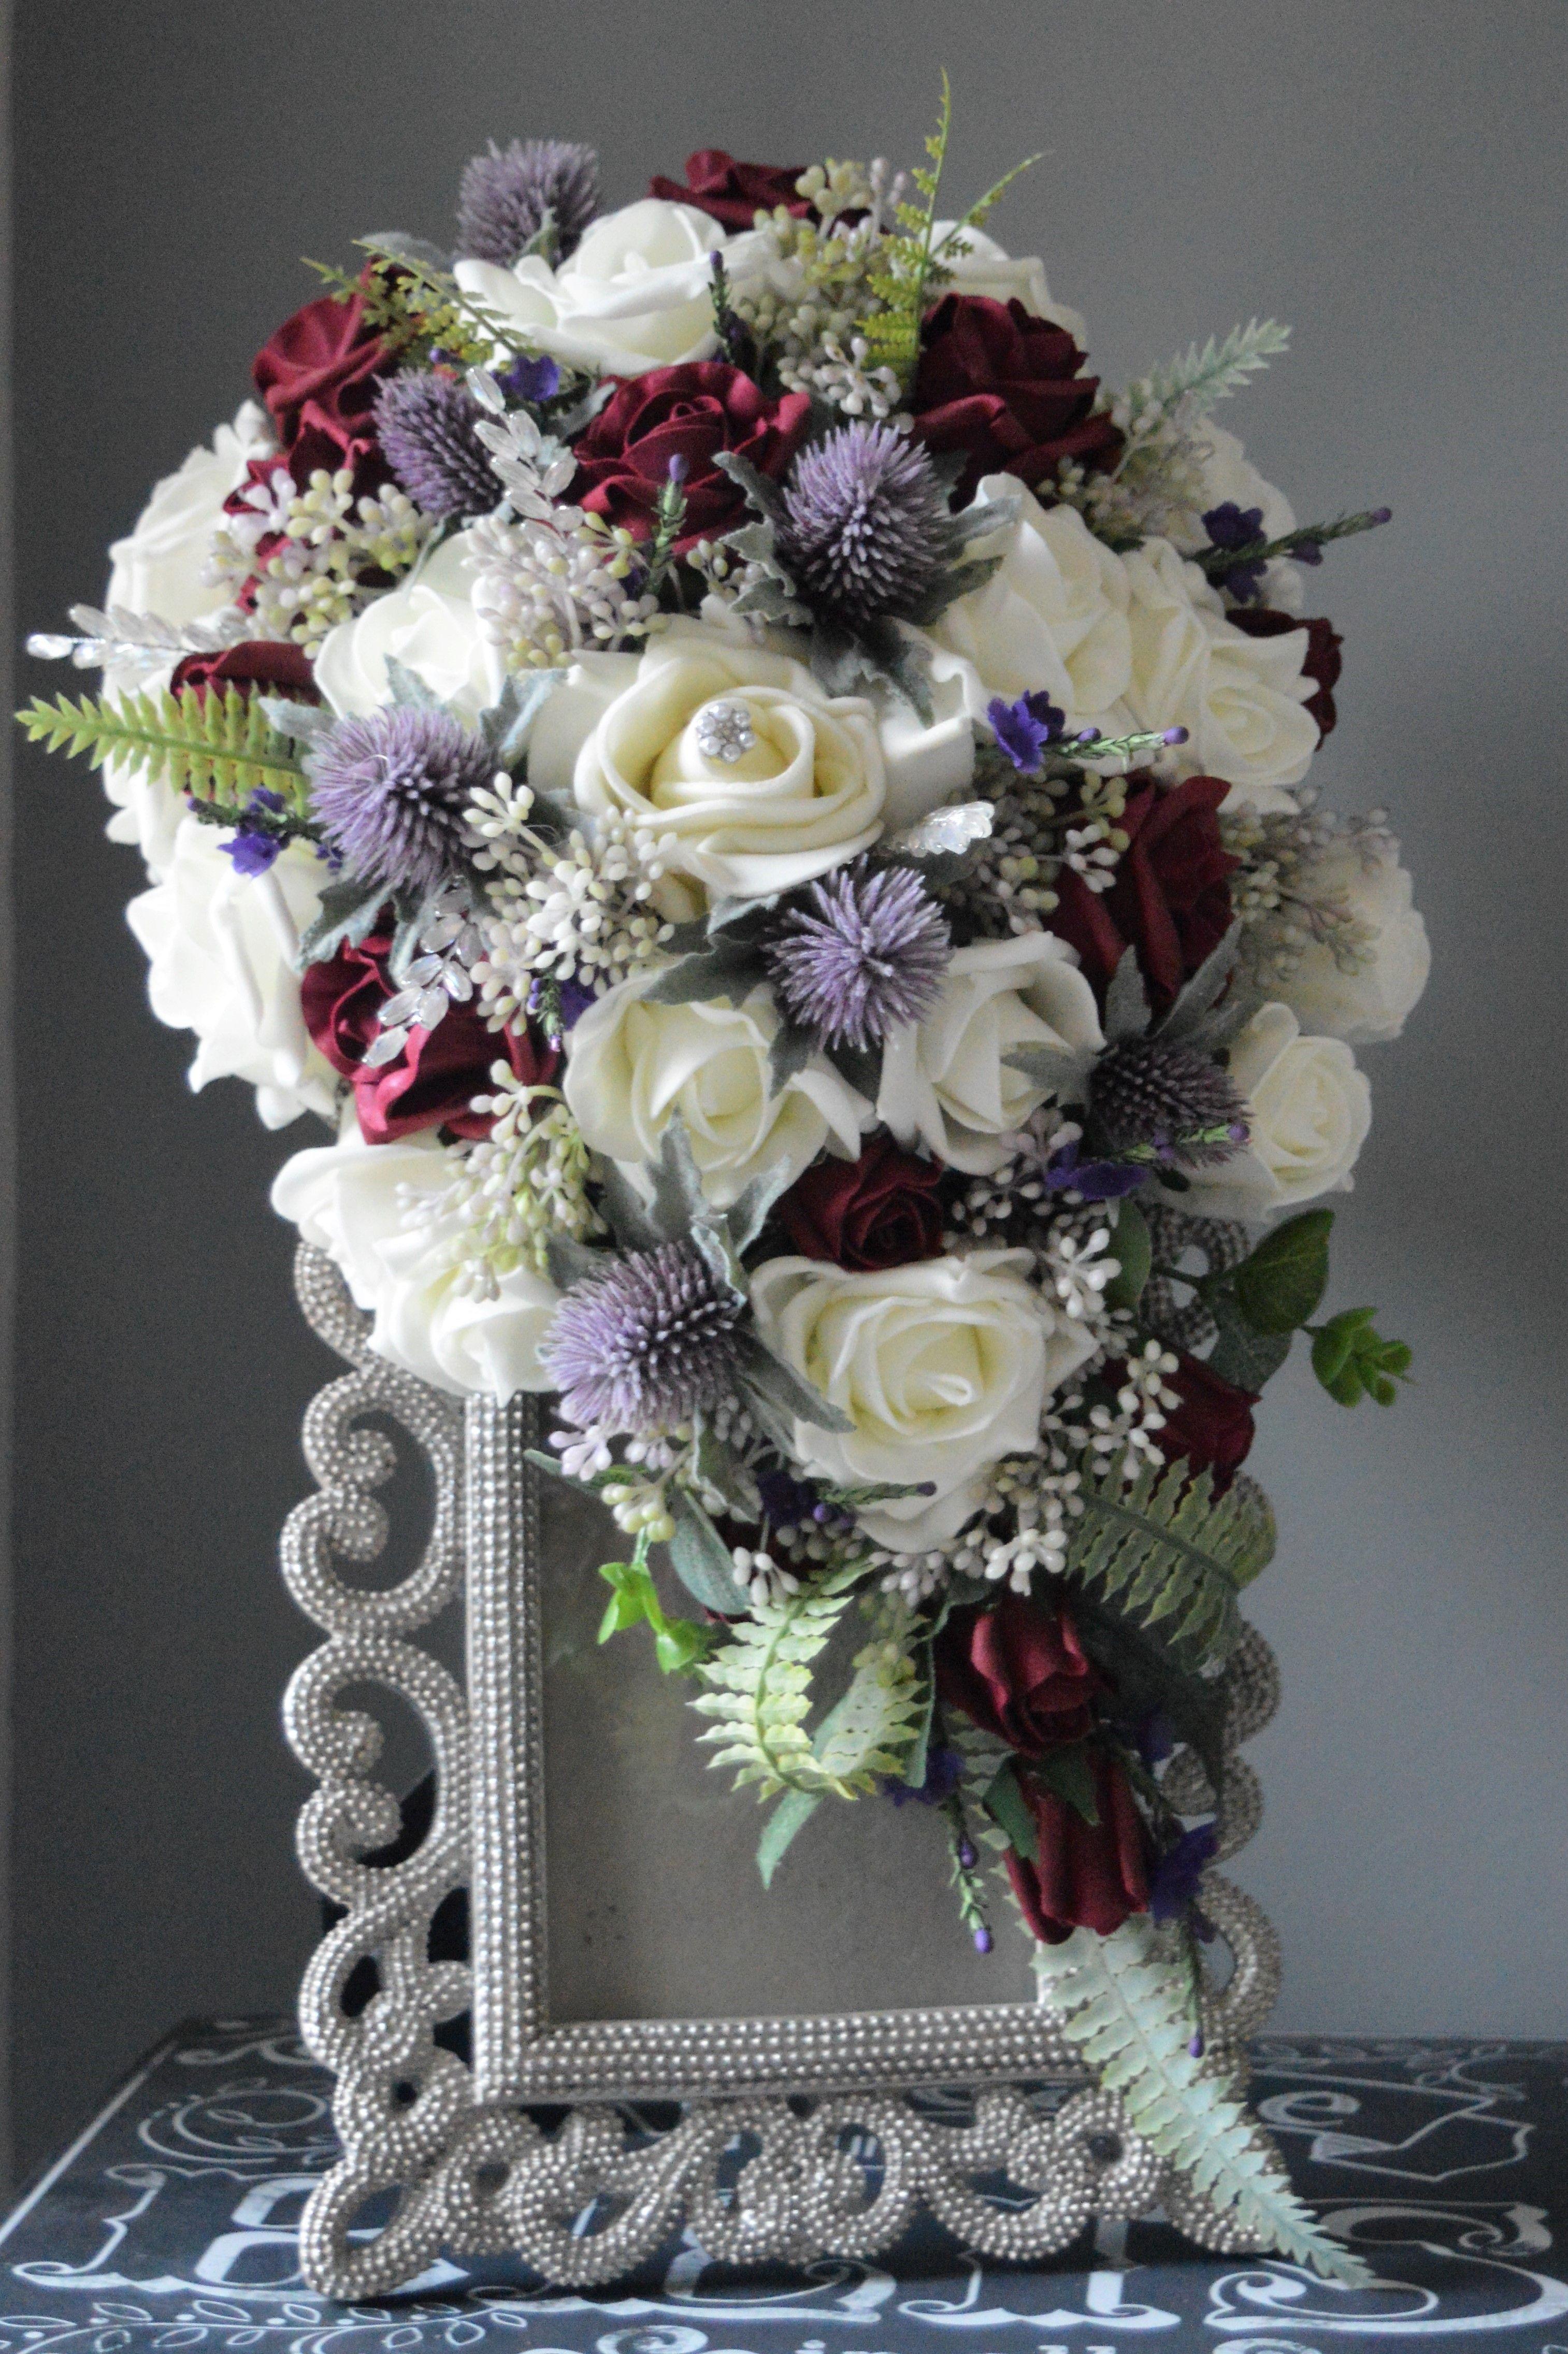 Sian's bespoke teardrop bouquet carries on the Scottish